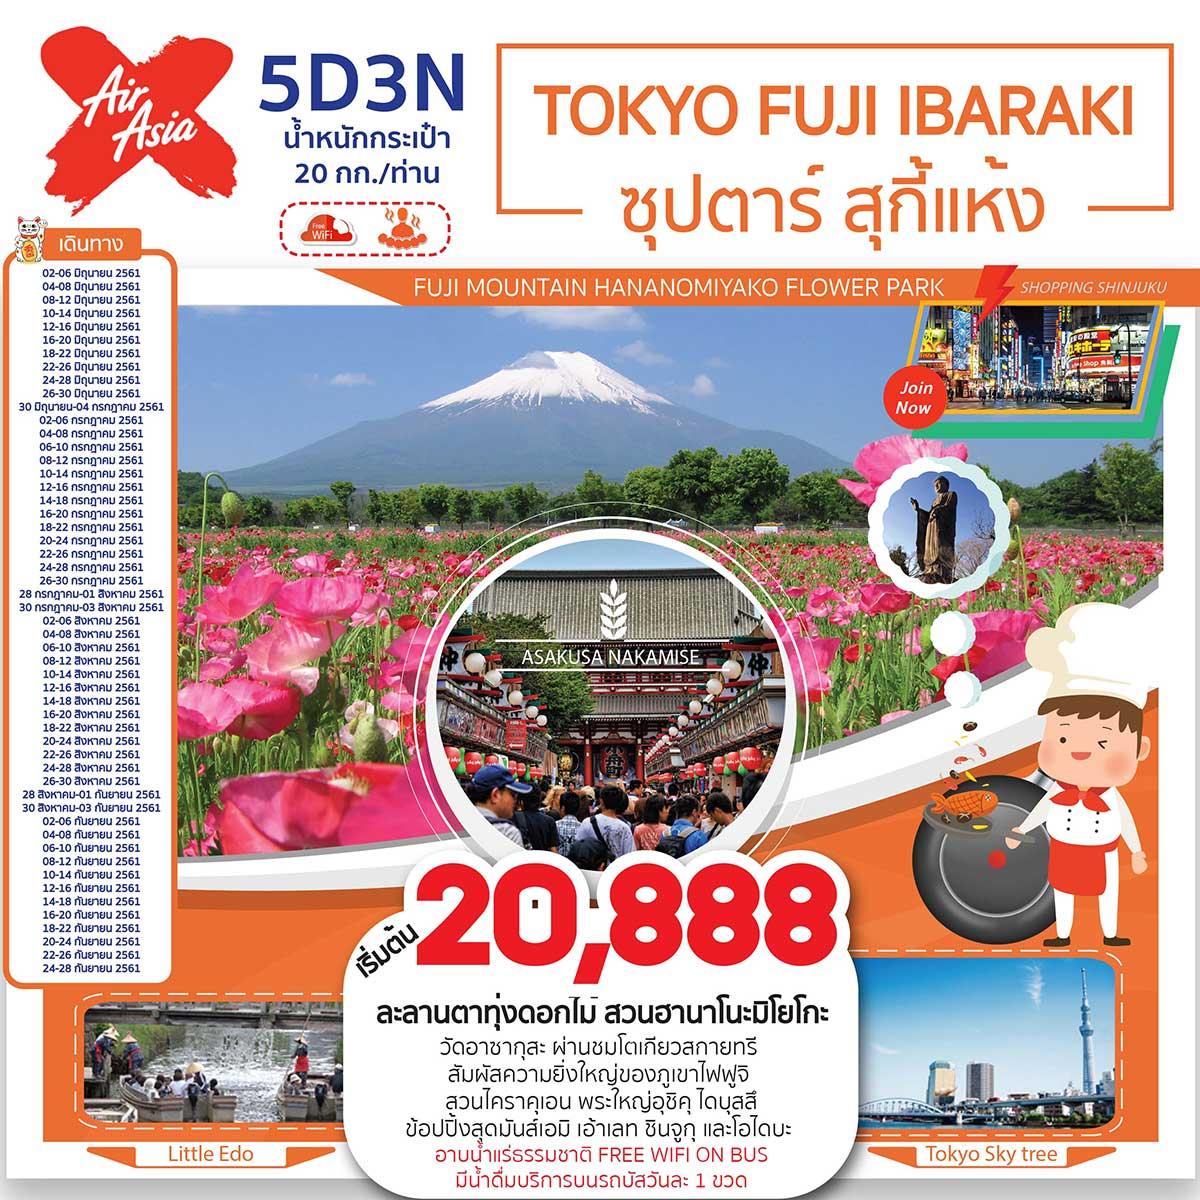 Tokoy Fuji Ibaraki (ซุปตาร์ สุกี้แห้ง) 5 D 3 N